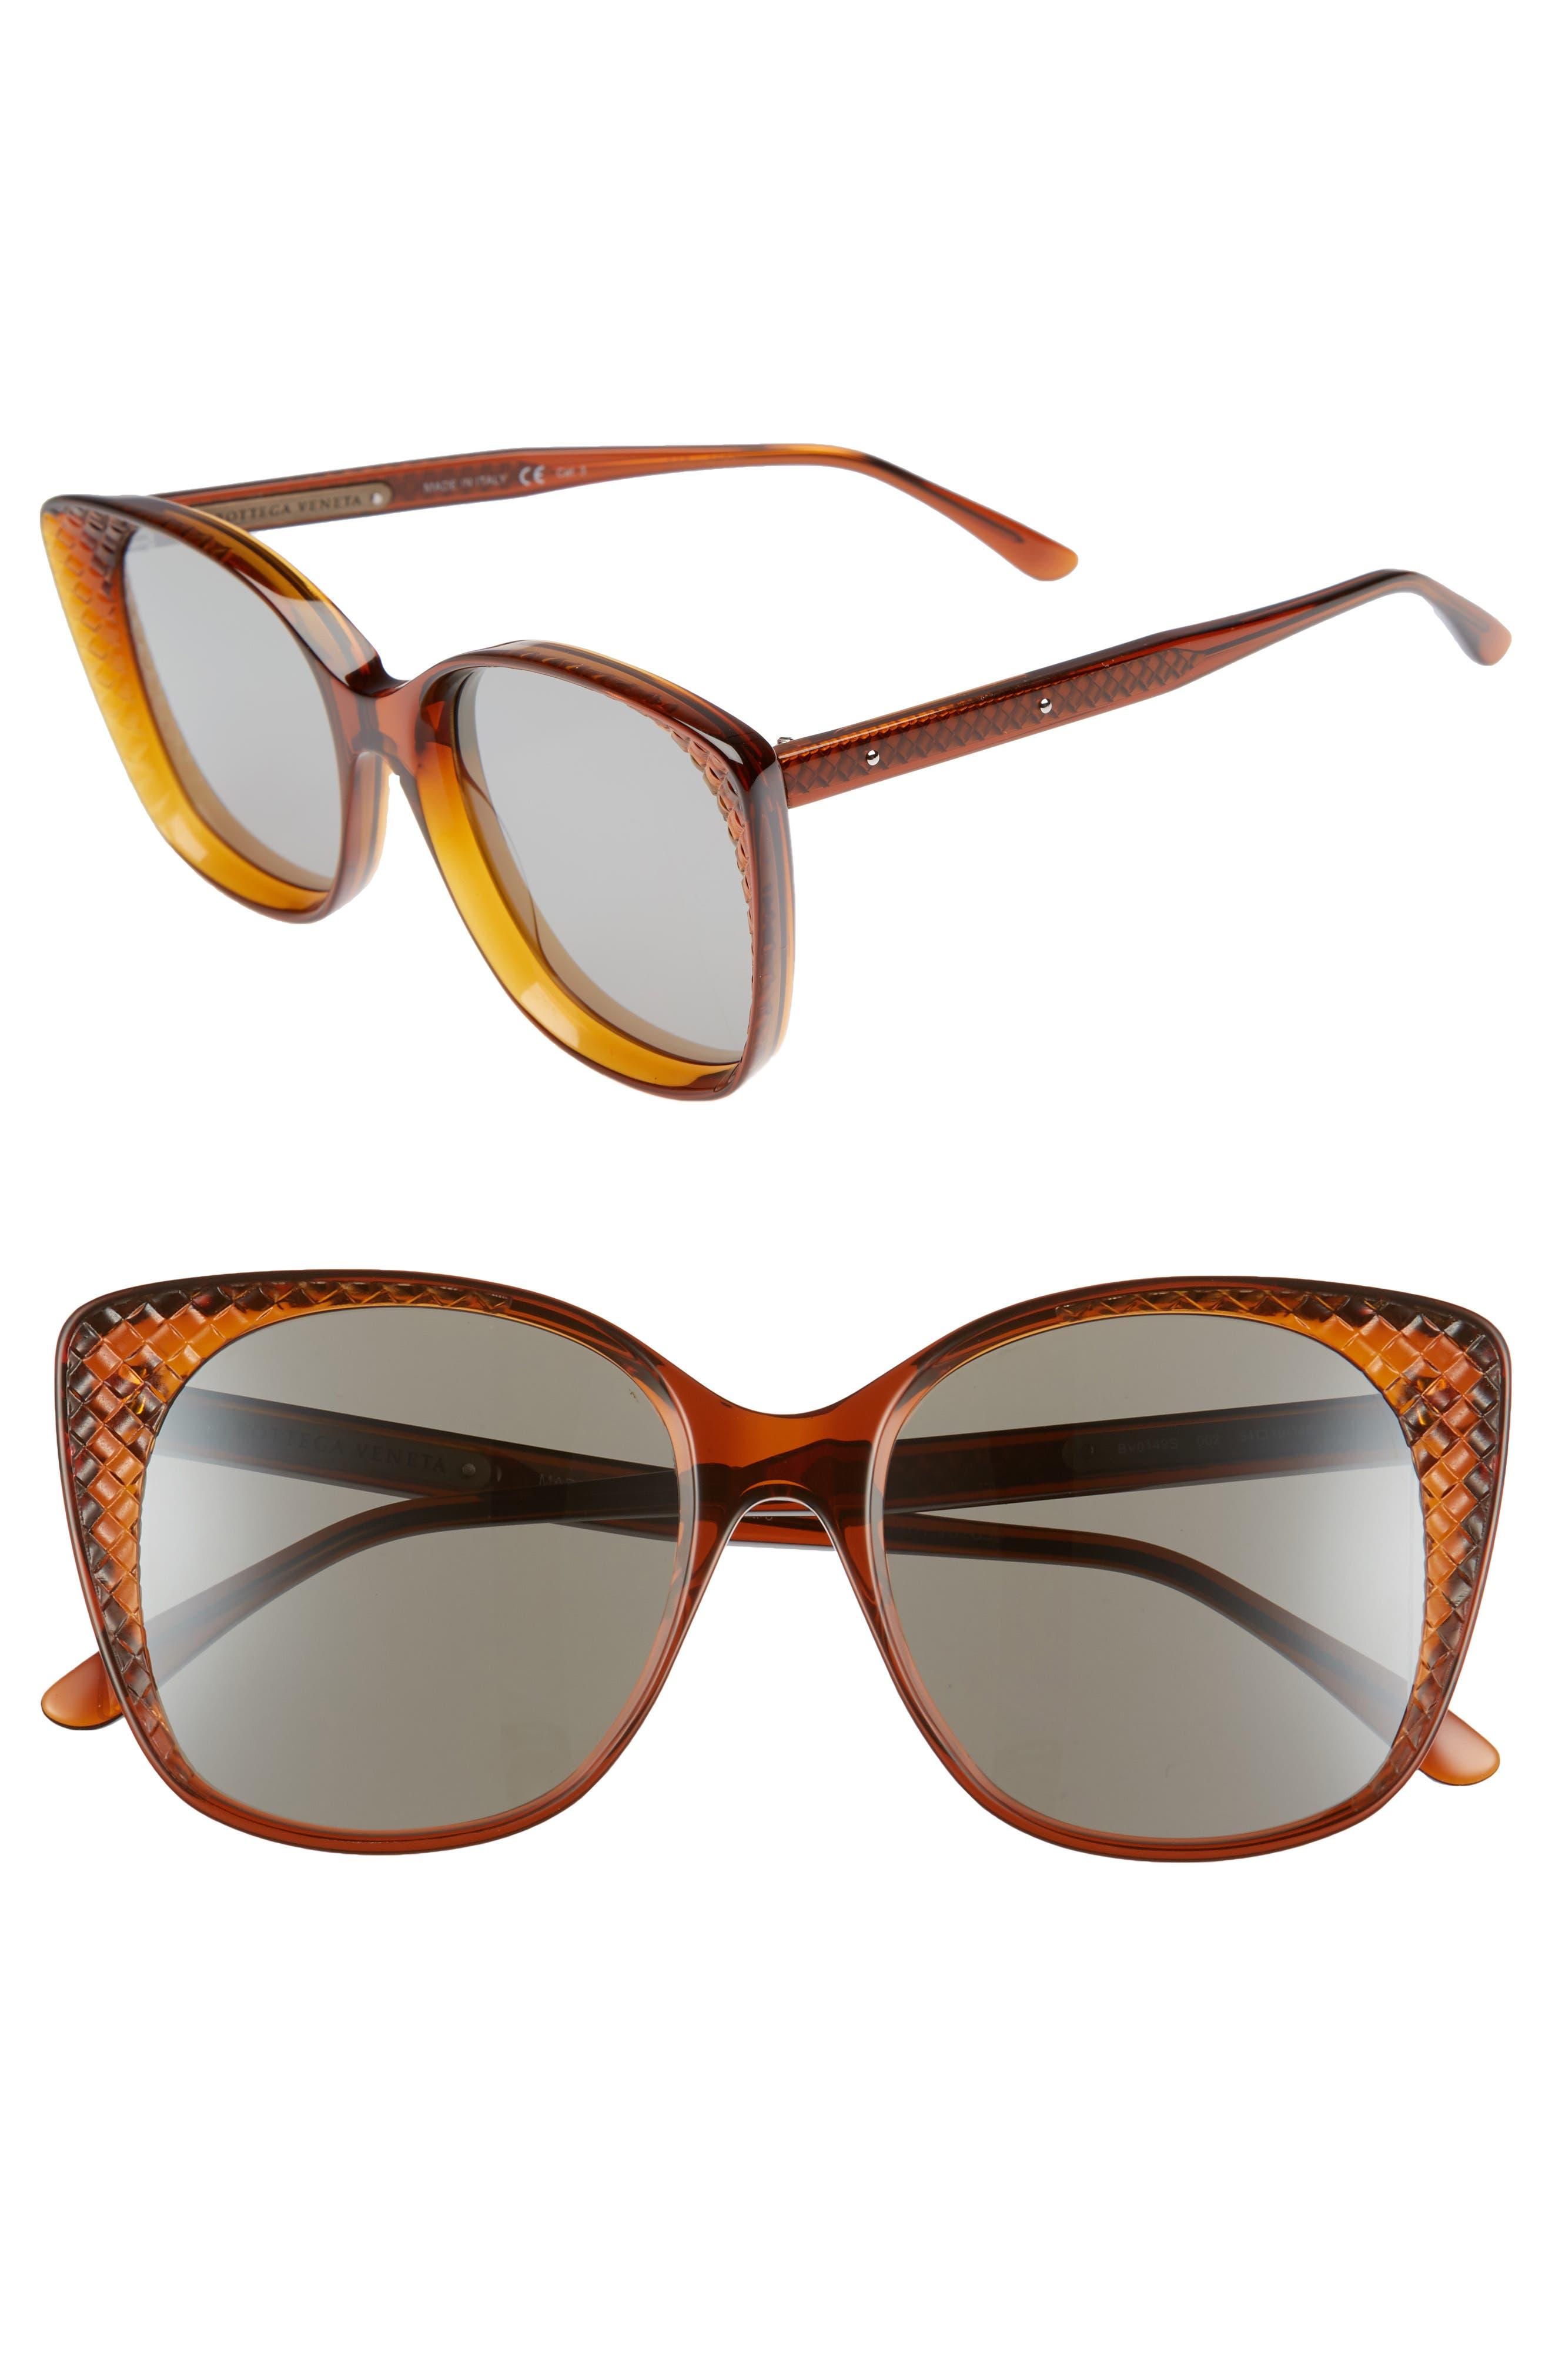 Main Image - Bottega Veneta 54mm Sunglasses